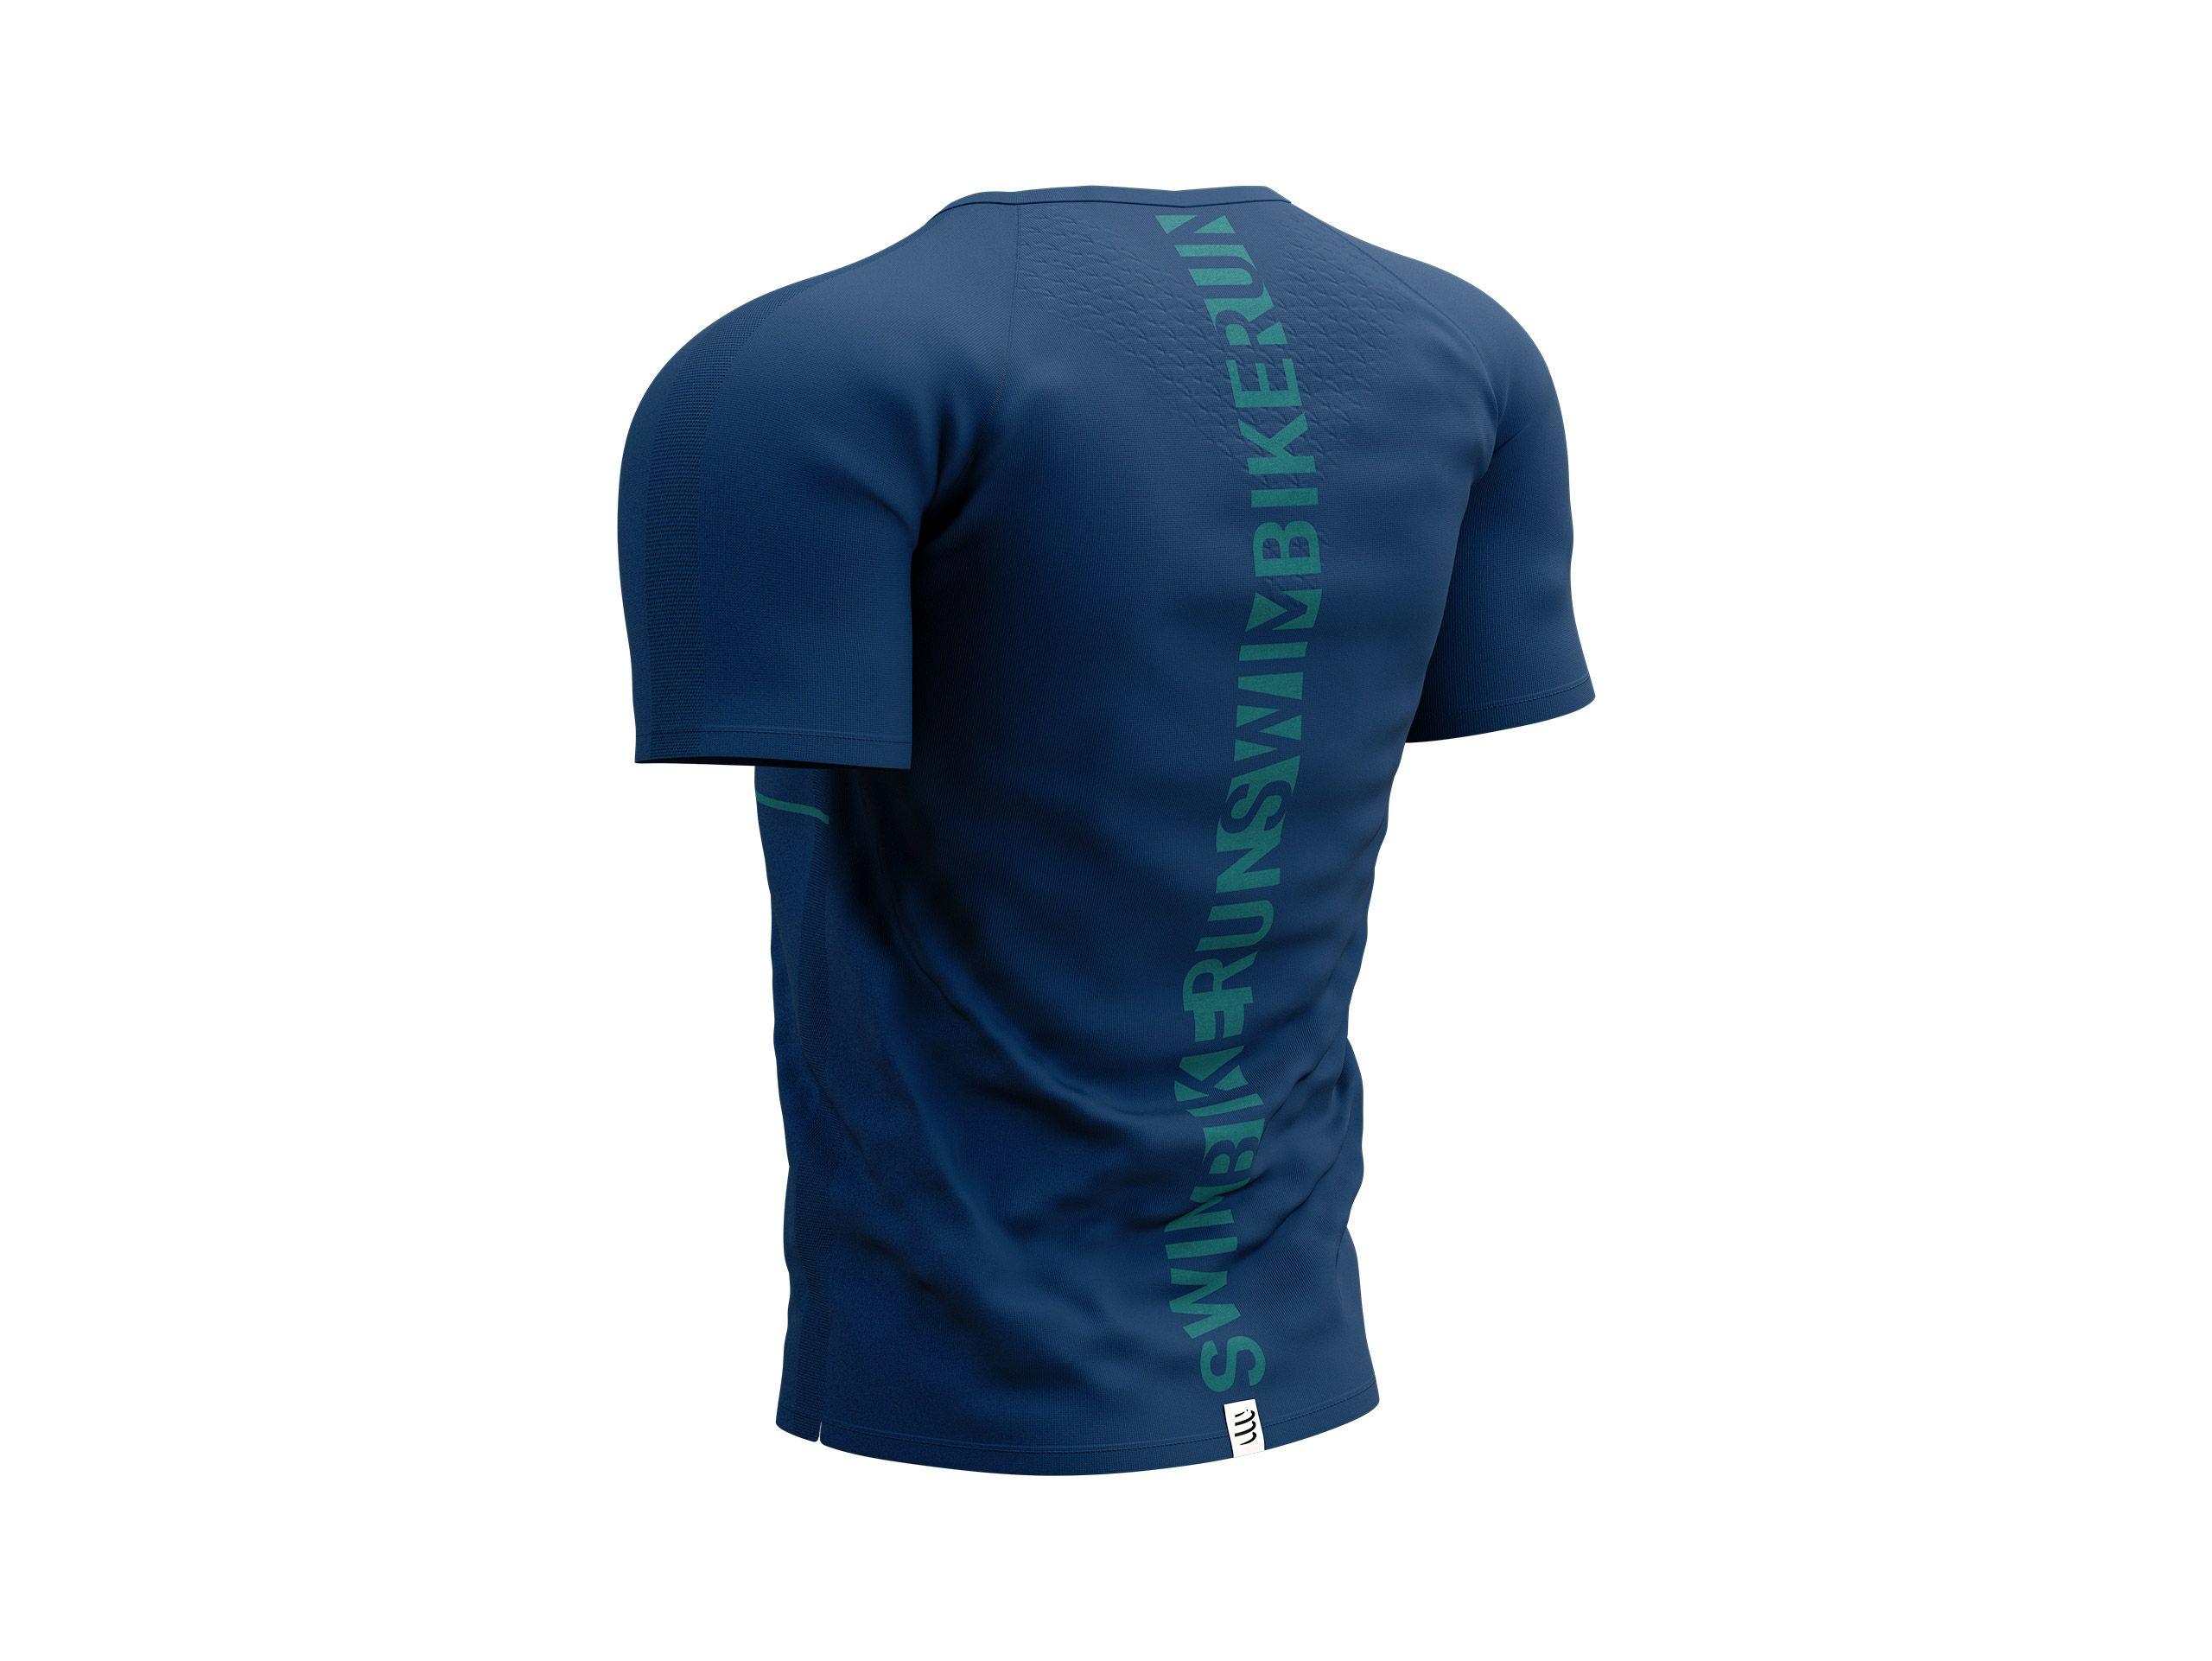 Training Tshirt SS - Born To SwimBikeRun 2021 MOONLIT OCEAN/D GREEN